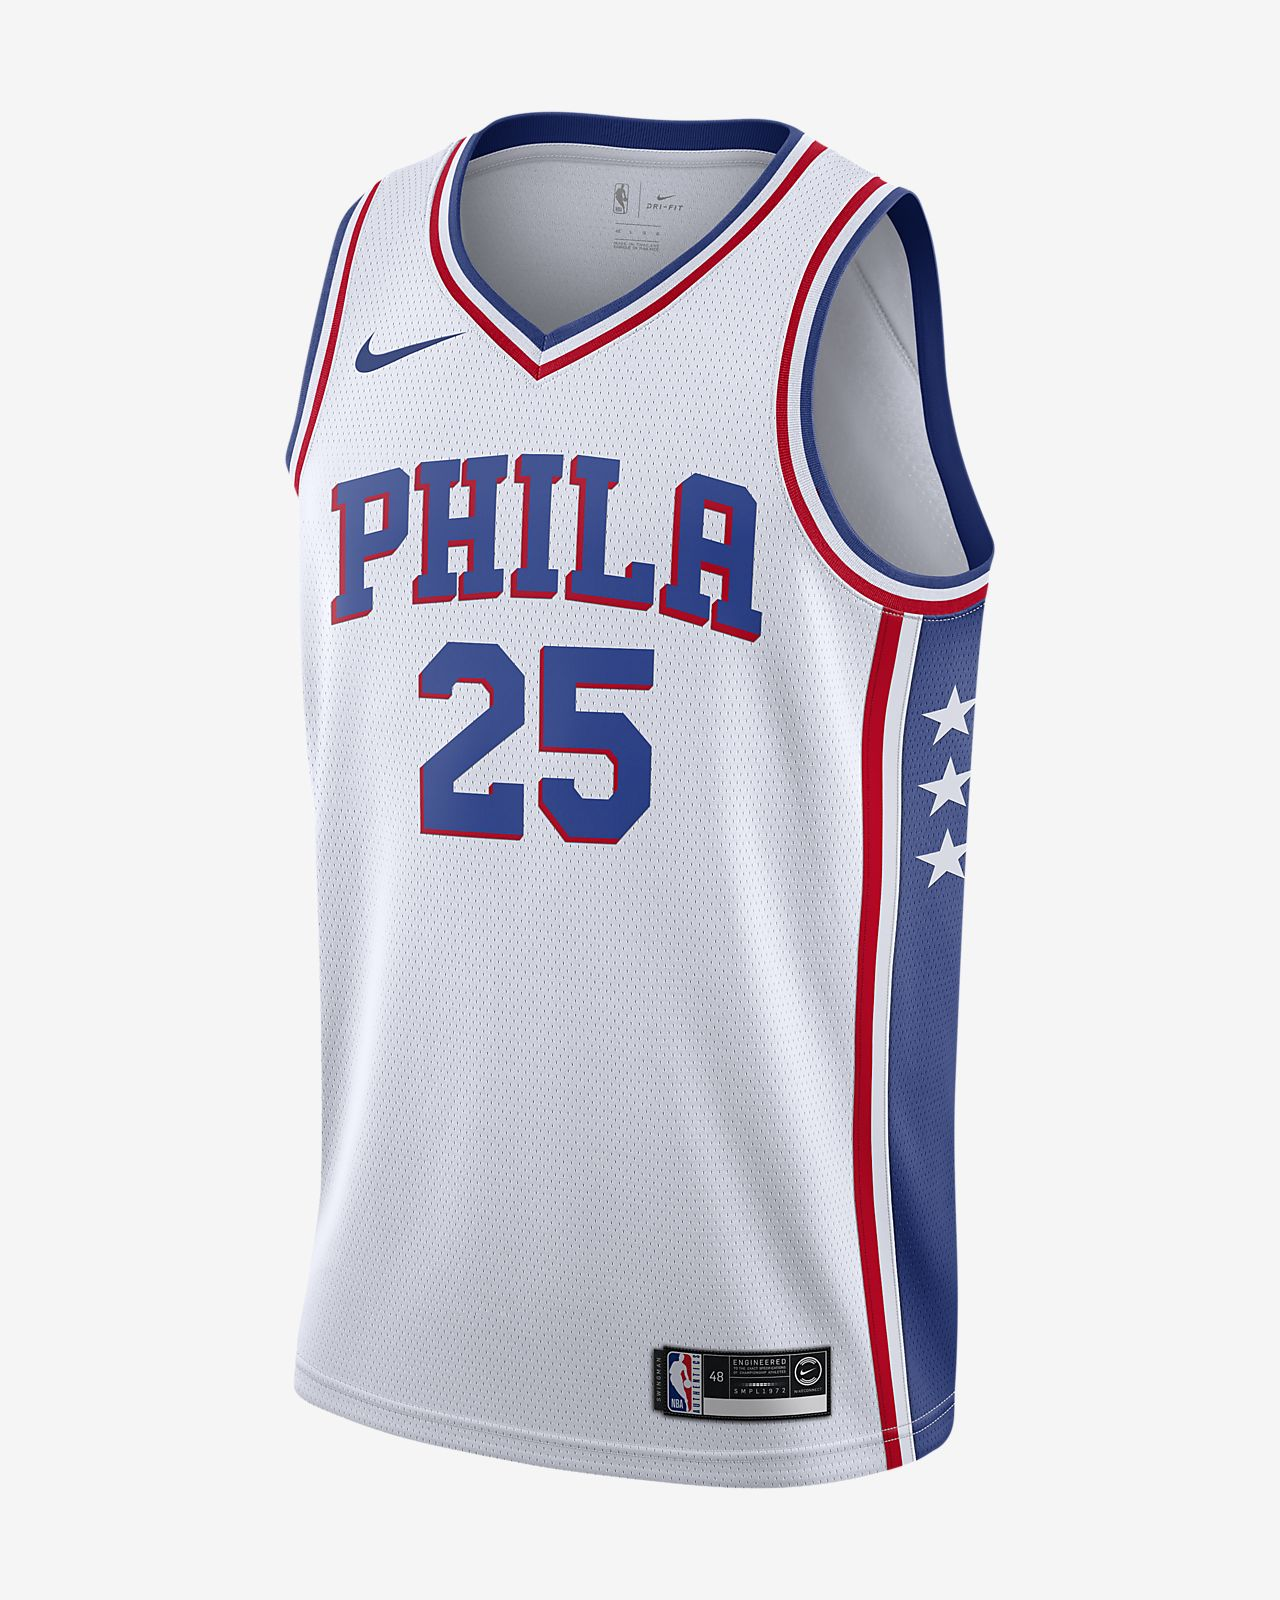 Ben Simmons 76ers Association Edition Nike NBA Swingman Trikot